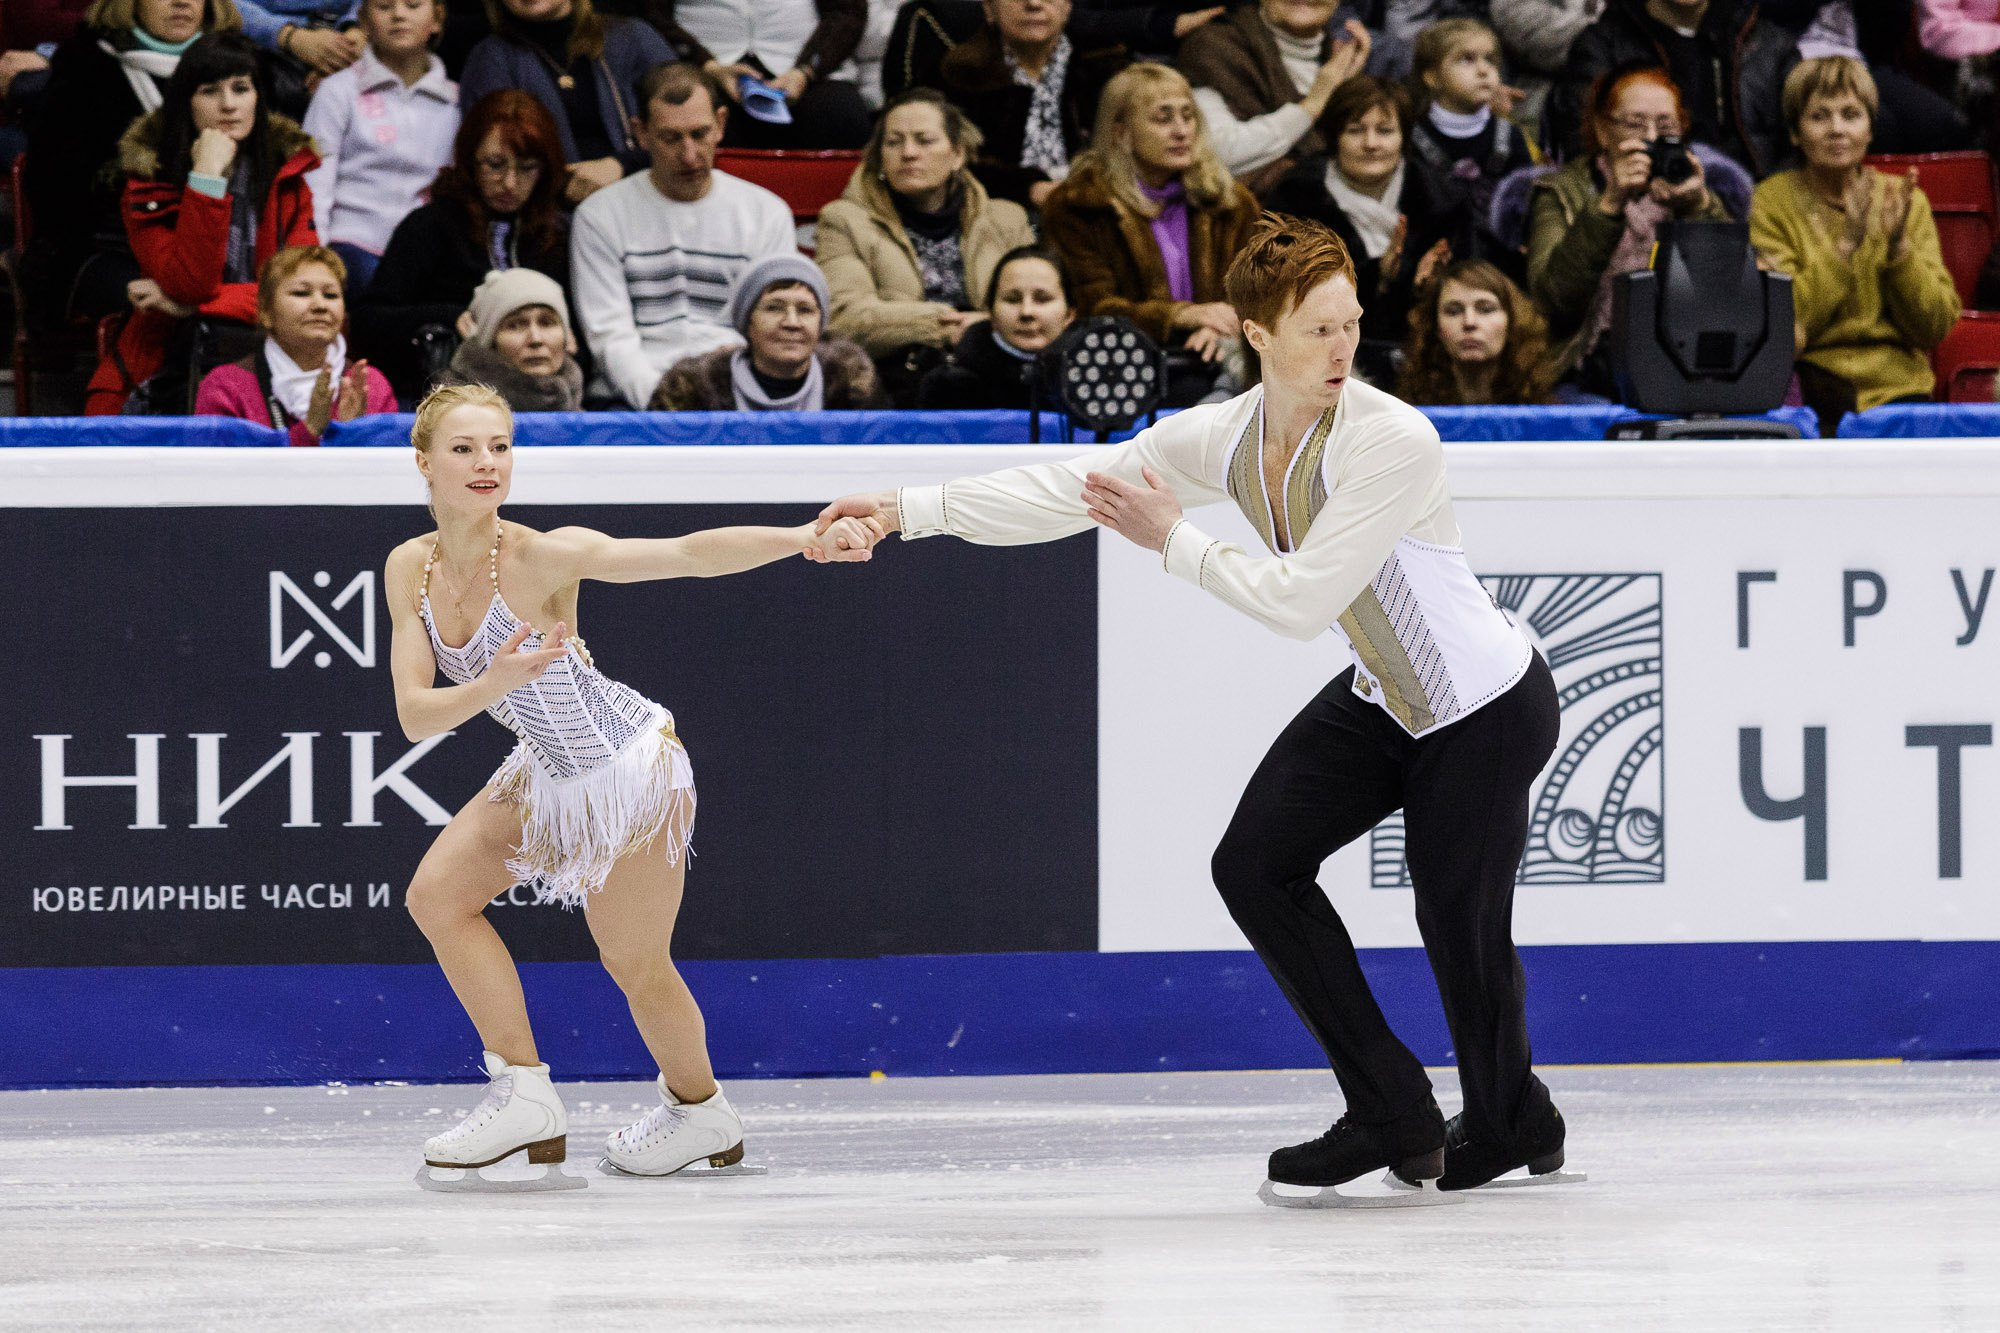 Евгения Тарасова и Владимир Морозов (26.12.2016)